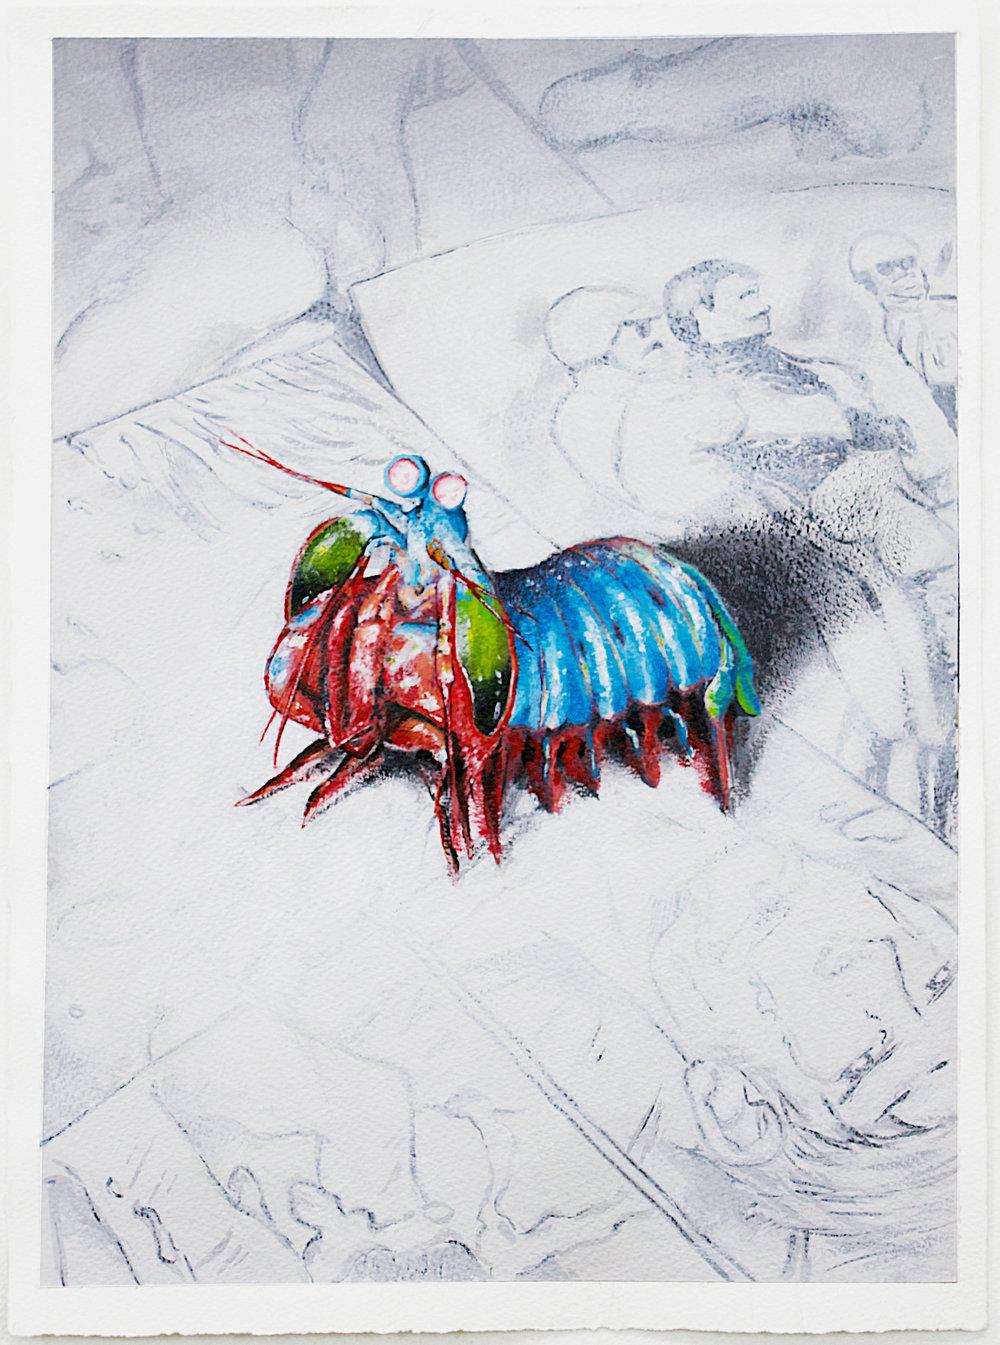 Mantis Shrimp on Comics, 2018